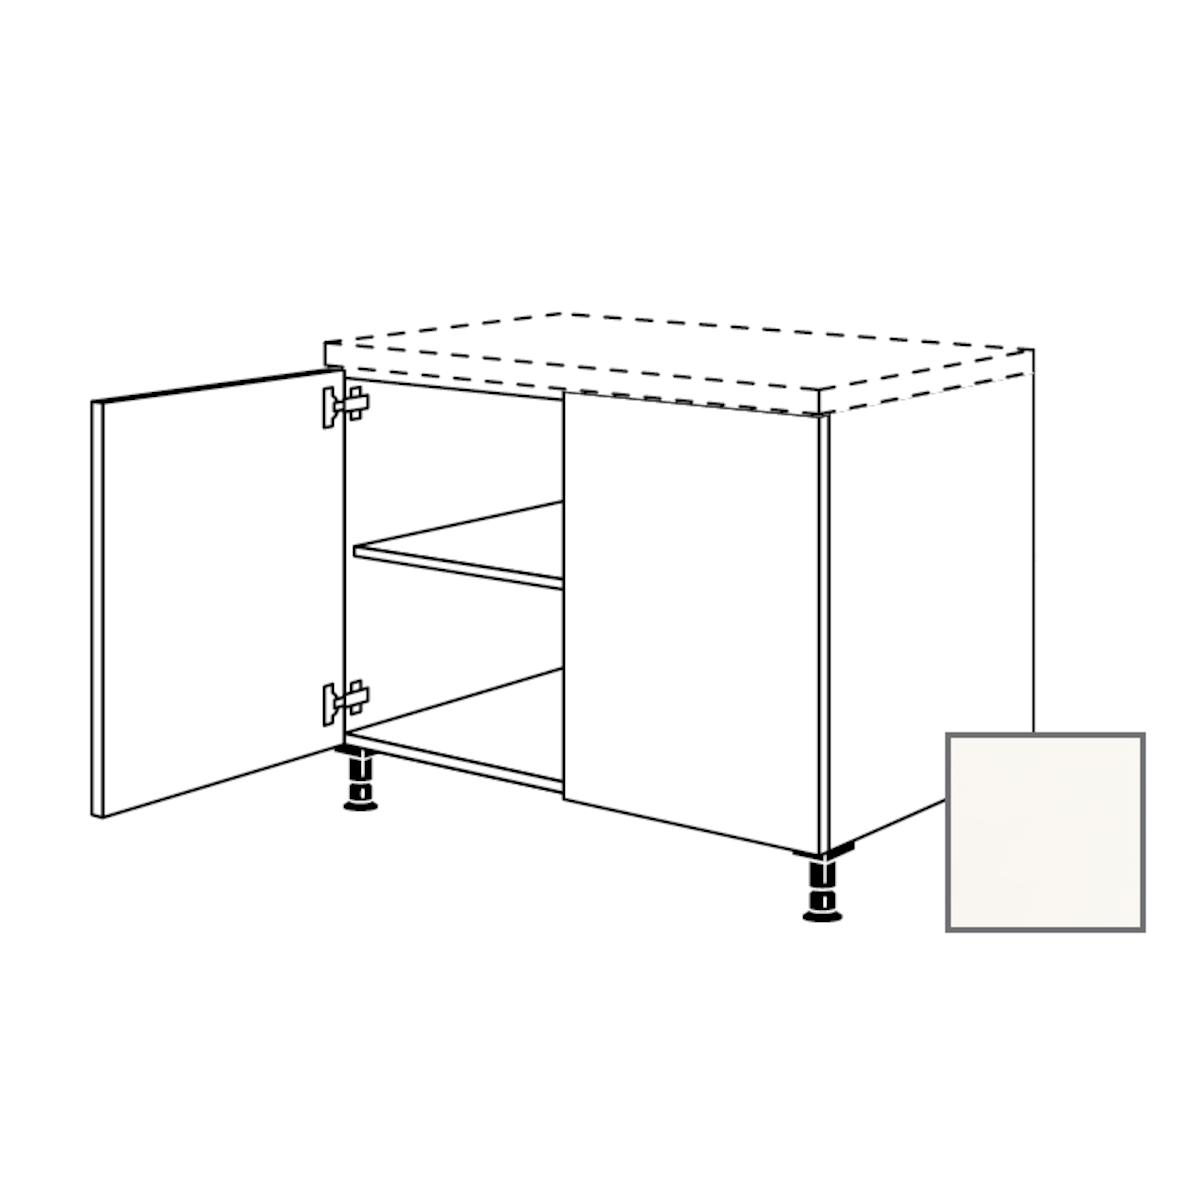 Kuchynská skrinka spodní Naturel Erika24 s dvierkami 90x87x56 cm bílá lesk 450.UD90